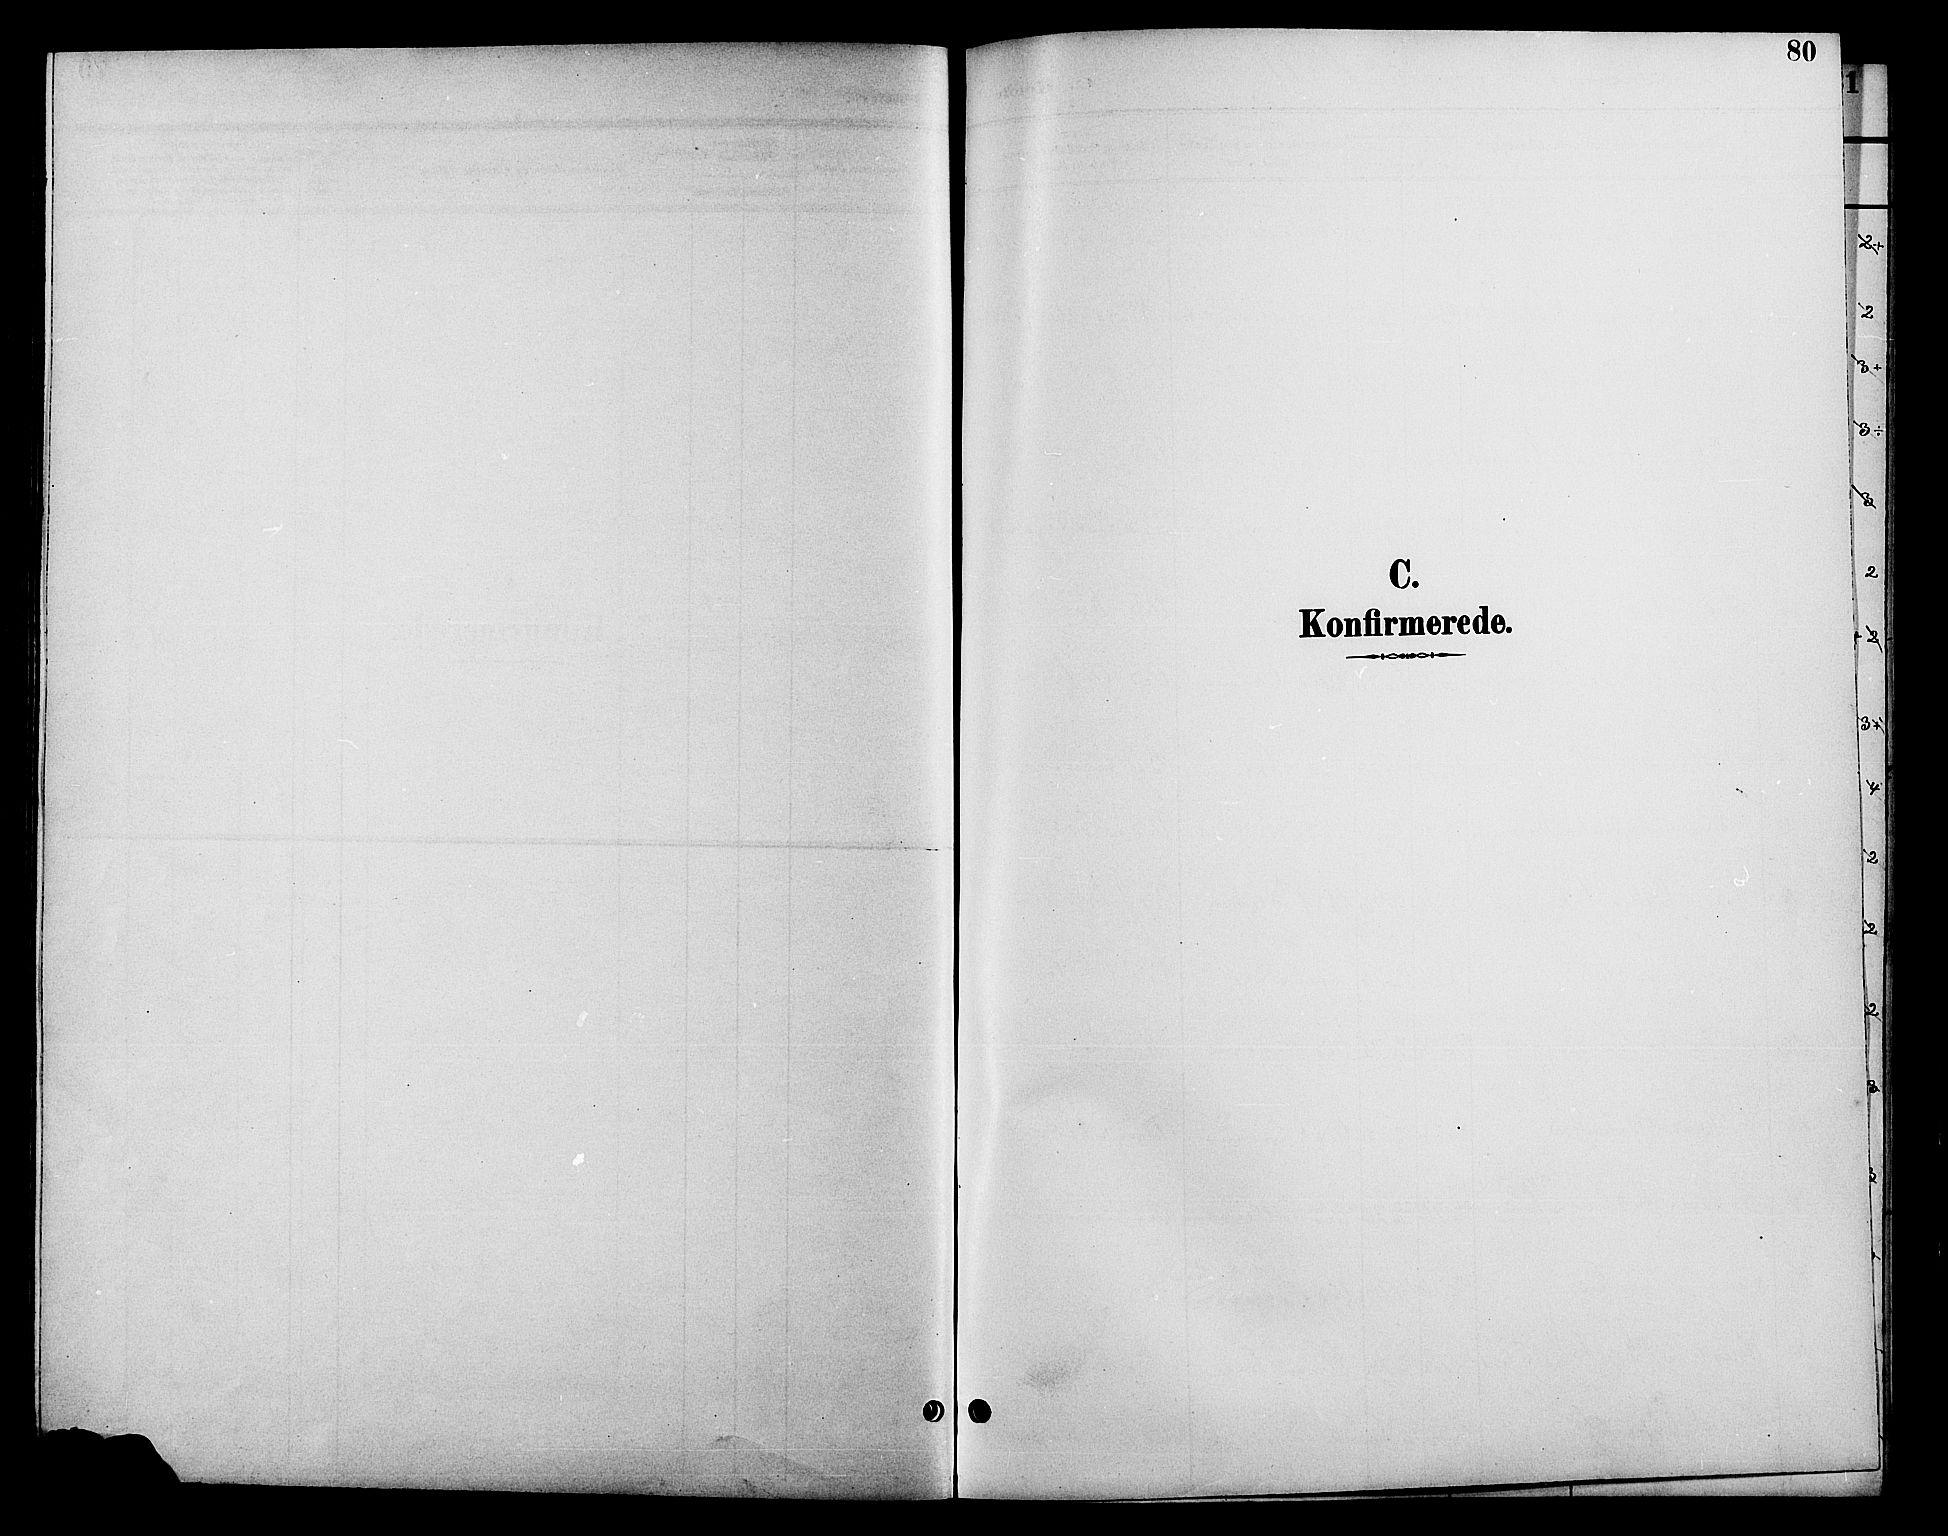 SAH, Fåberg prestekontor, Klokkerbok nr. 10, 1892-1900, s. 80